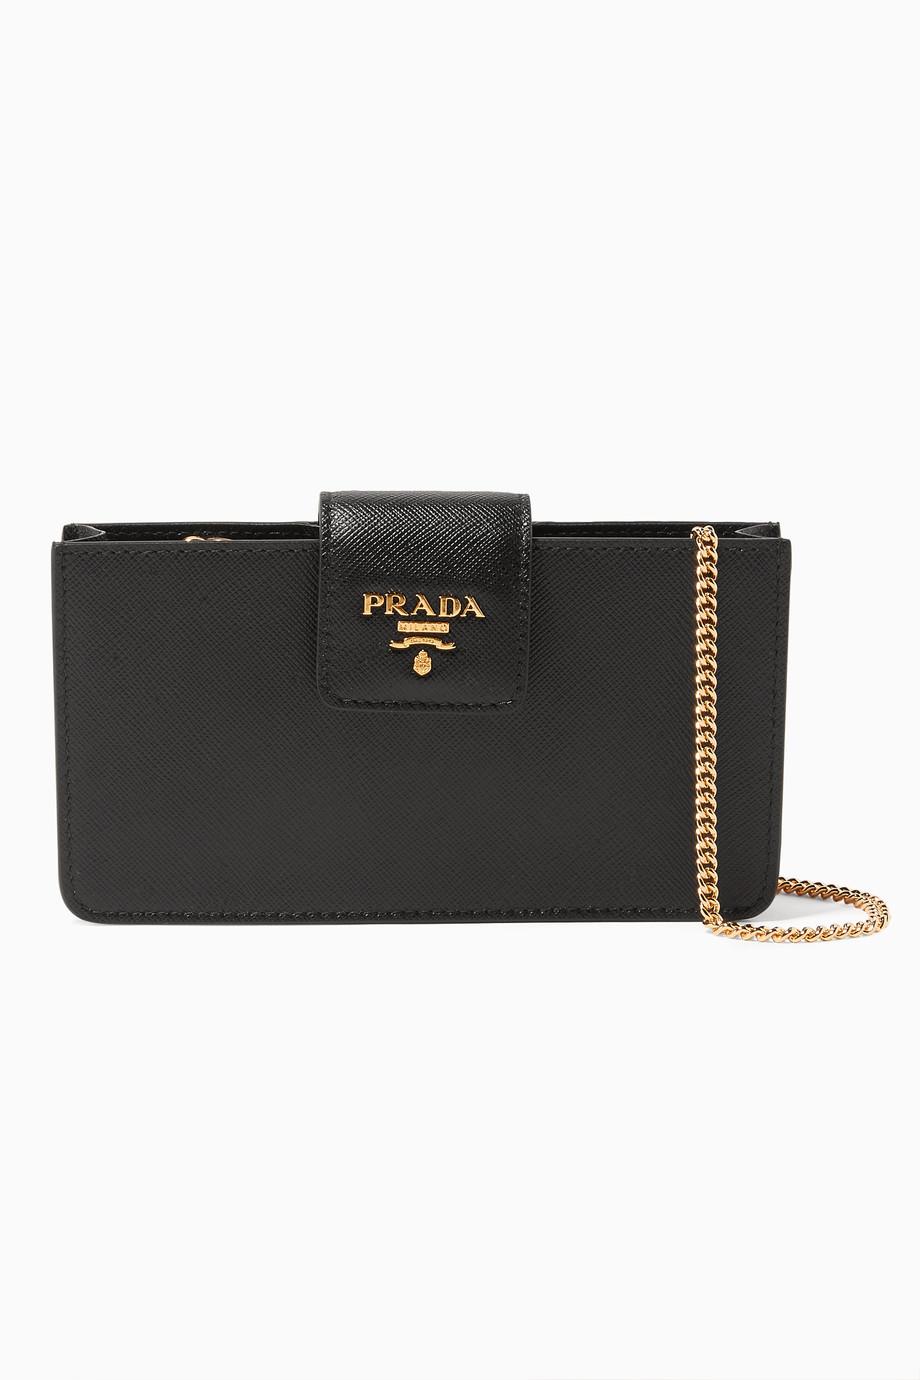 on sale a8306 a9c26 Shop Prada Black Black Saffiano iPhone Chain Wallet Shoulder Bag for ...